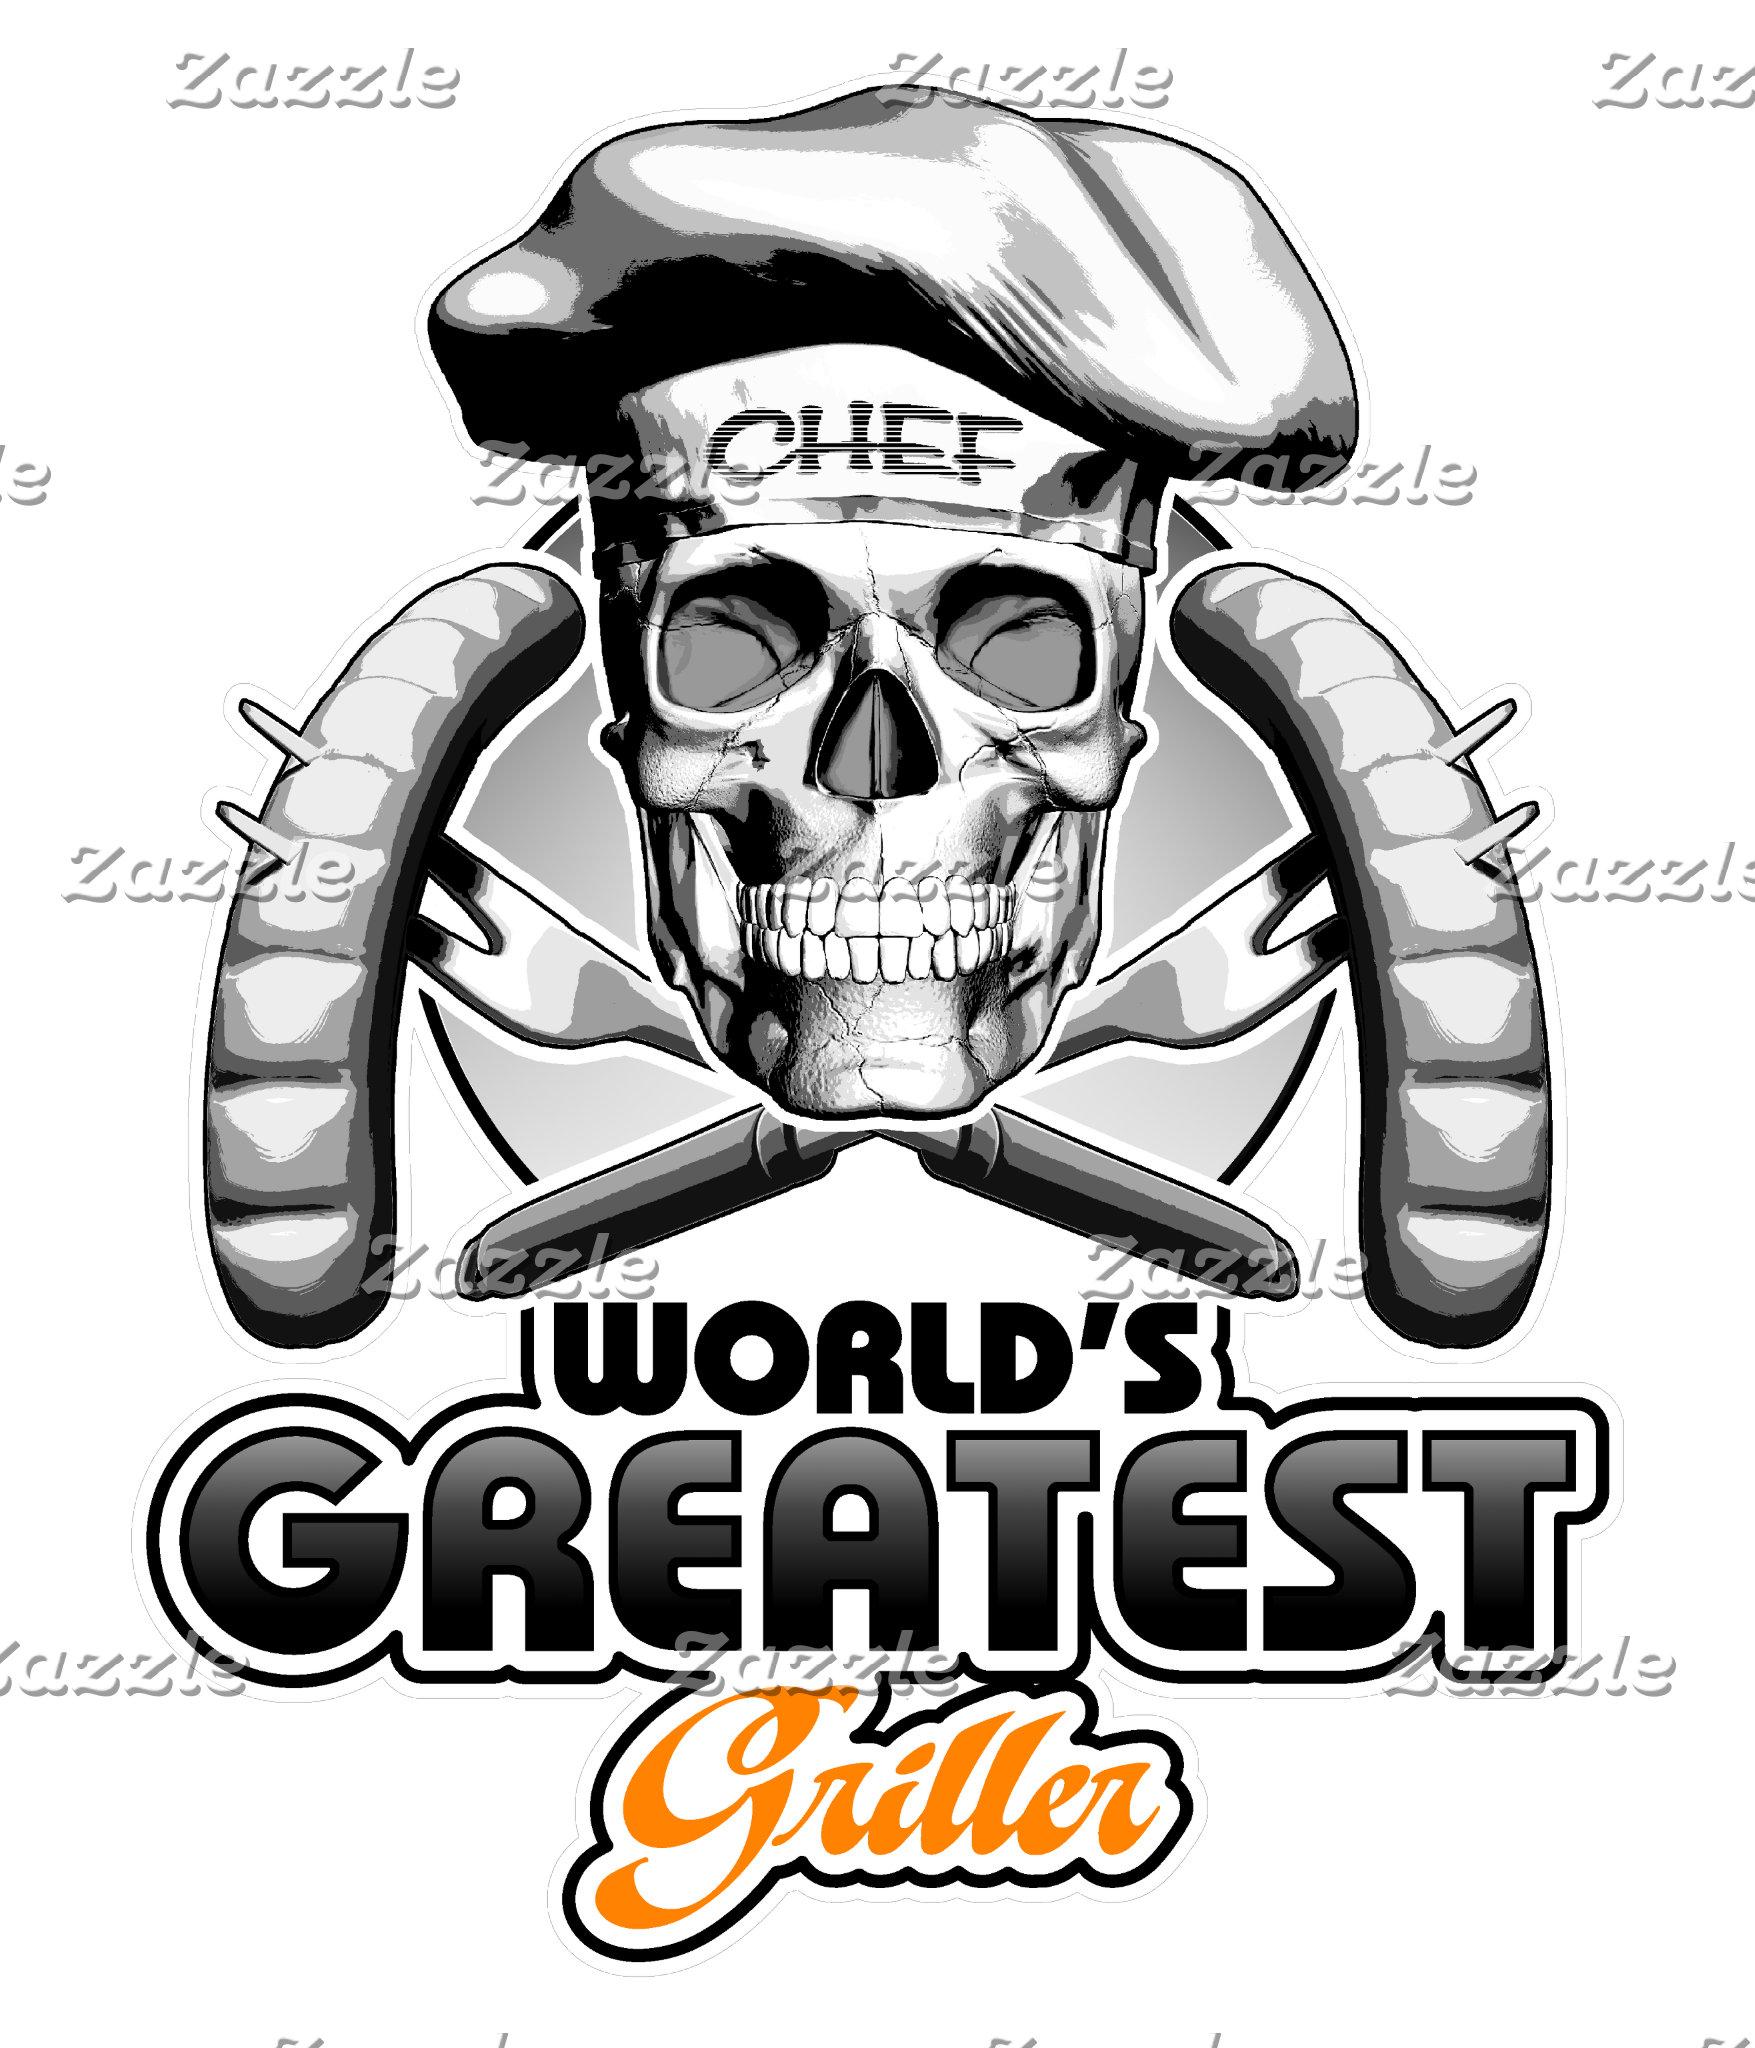 World's Greatest Griller v5